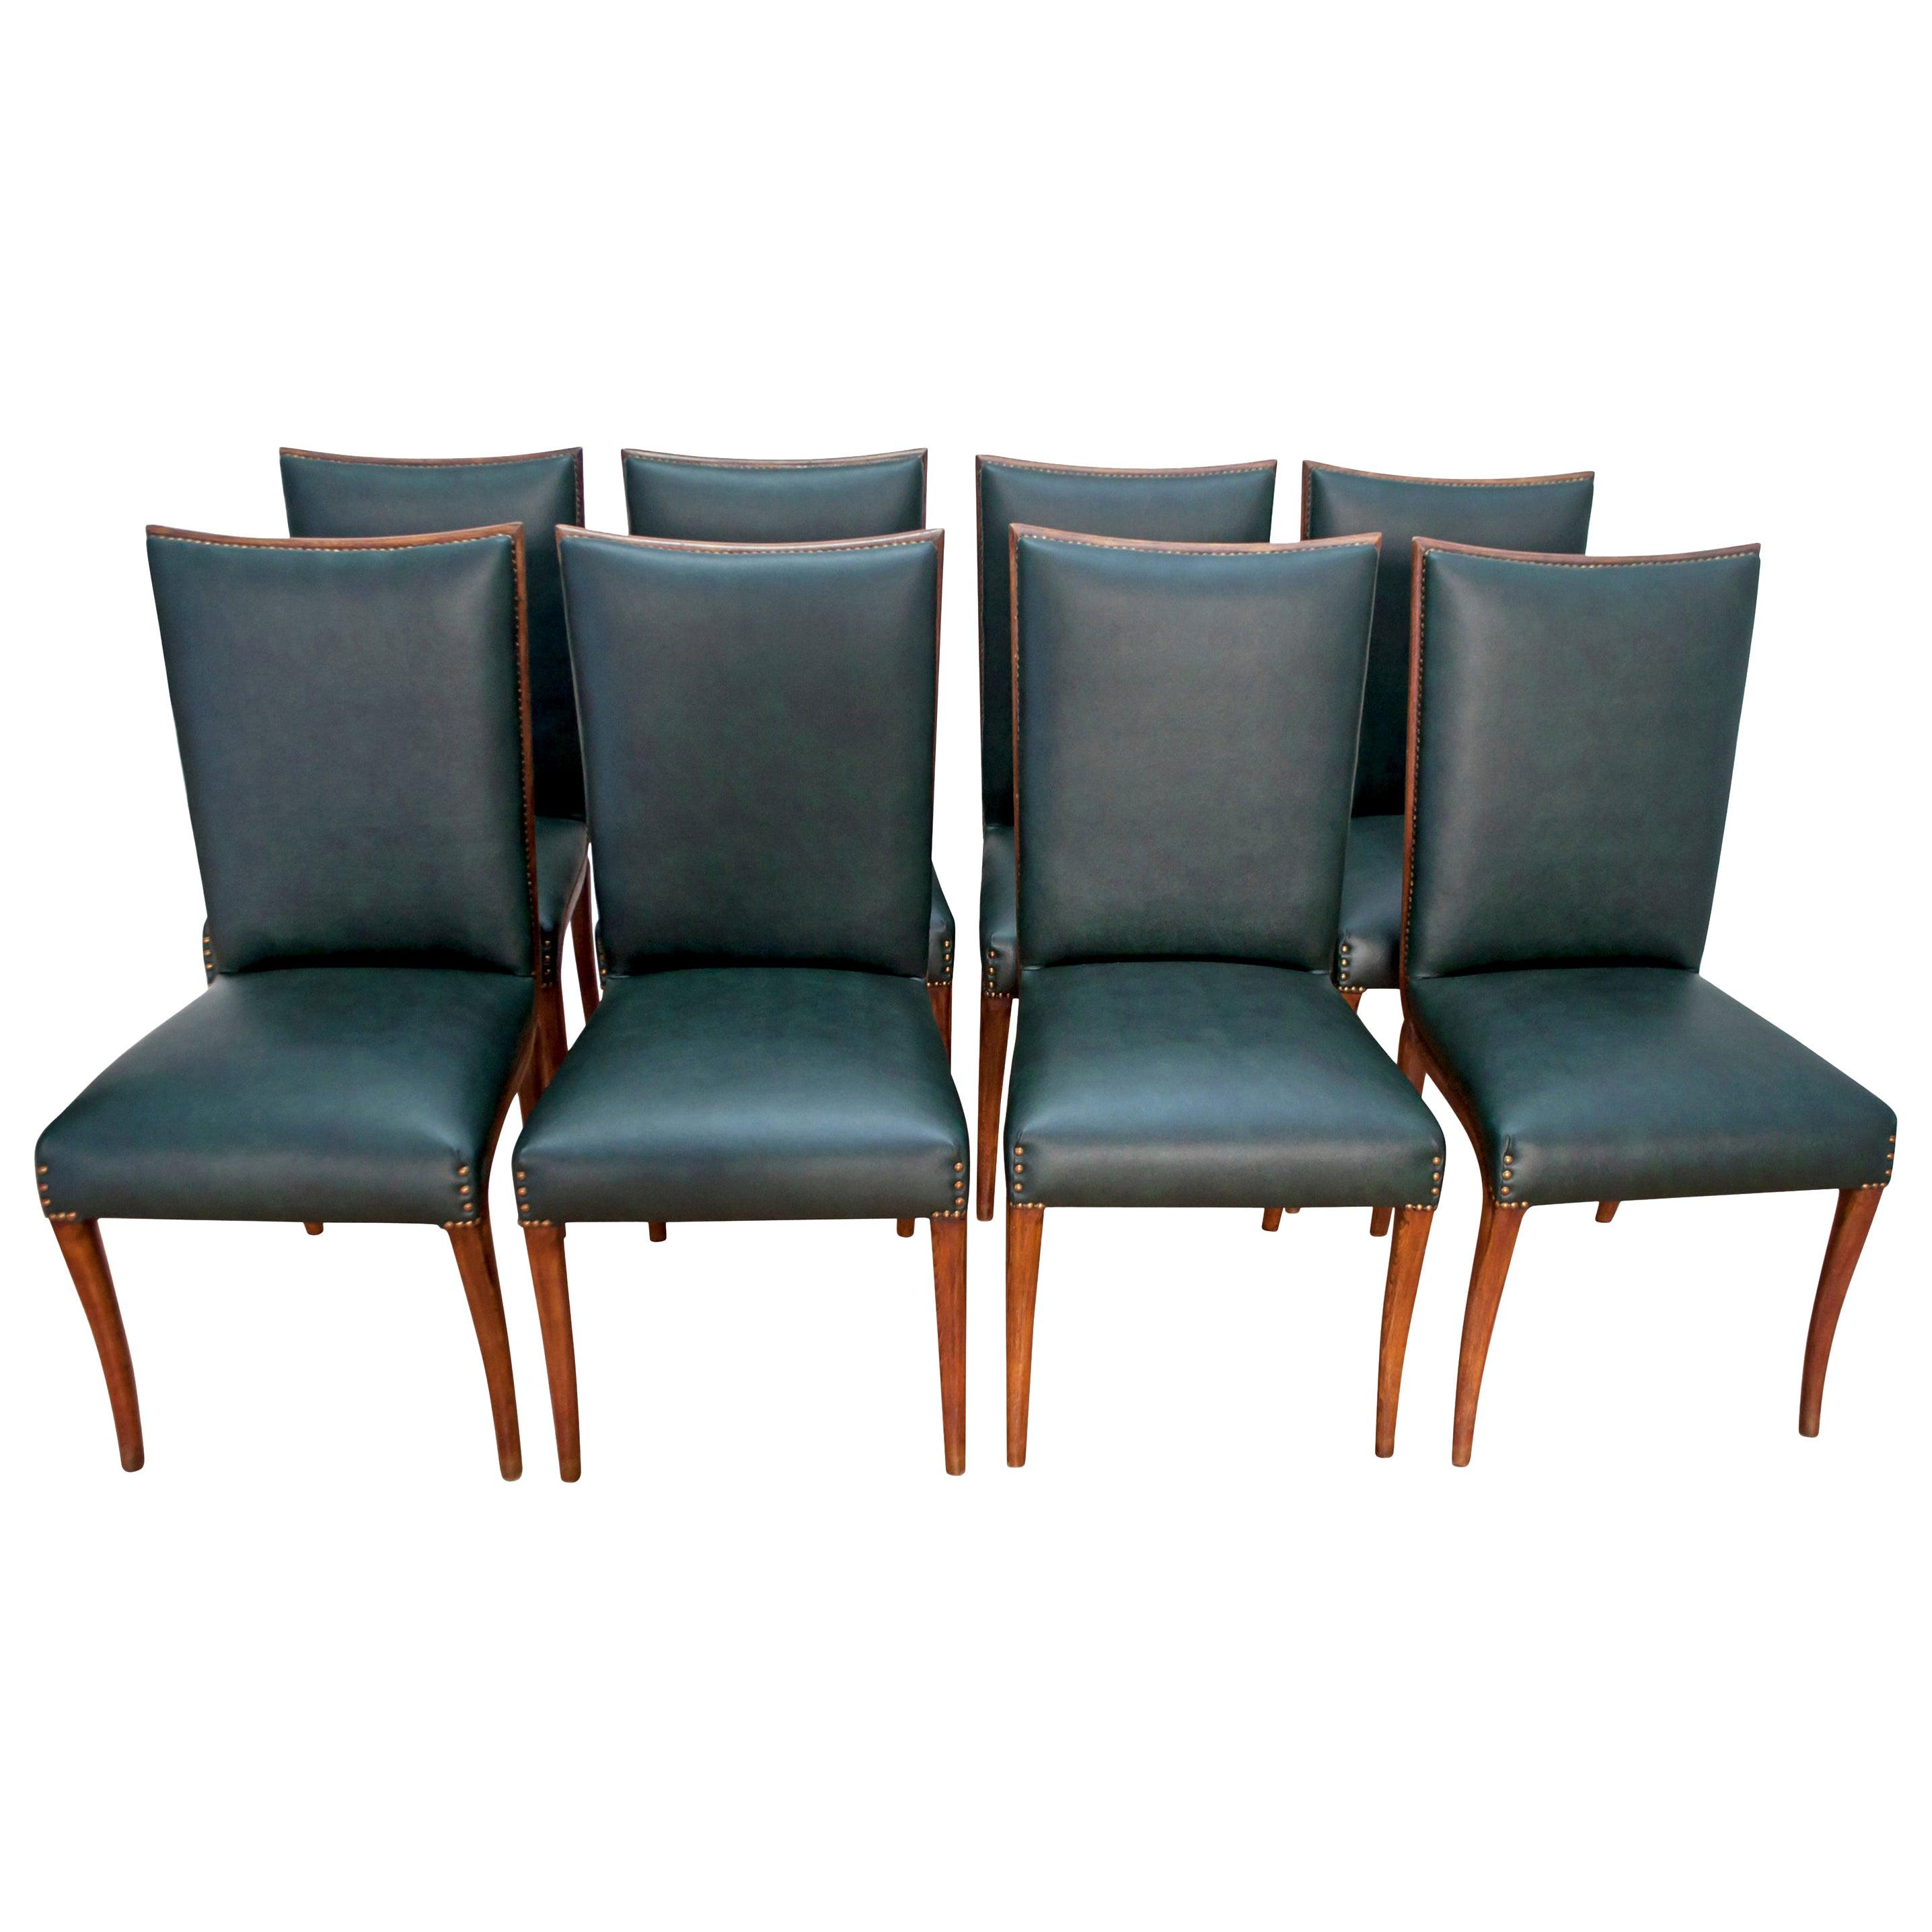 Vittorio Dassi Mid-Century Modern Italian Walnut Eight Dining Chairs, 1950s